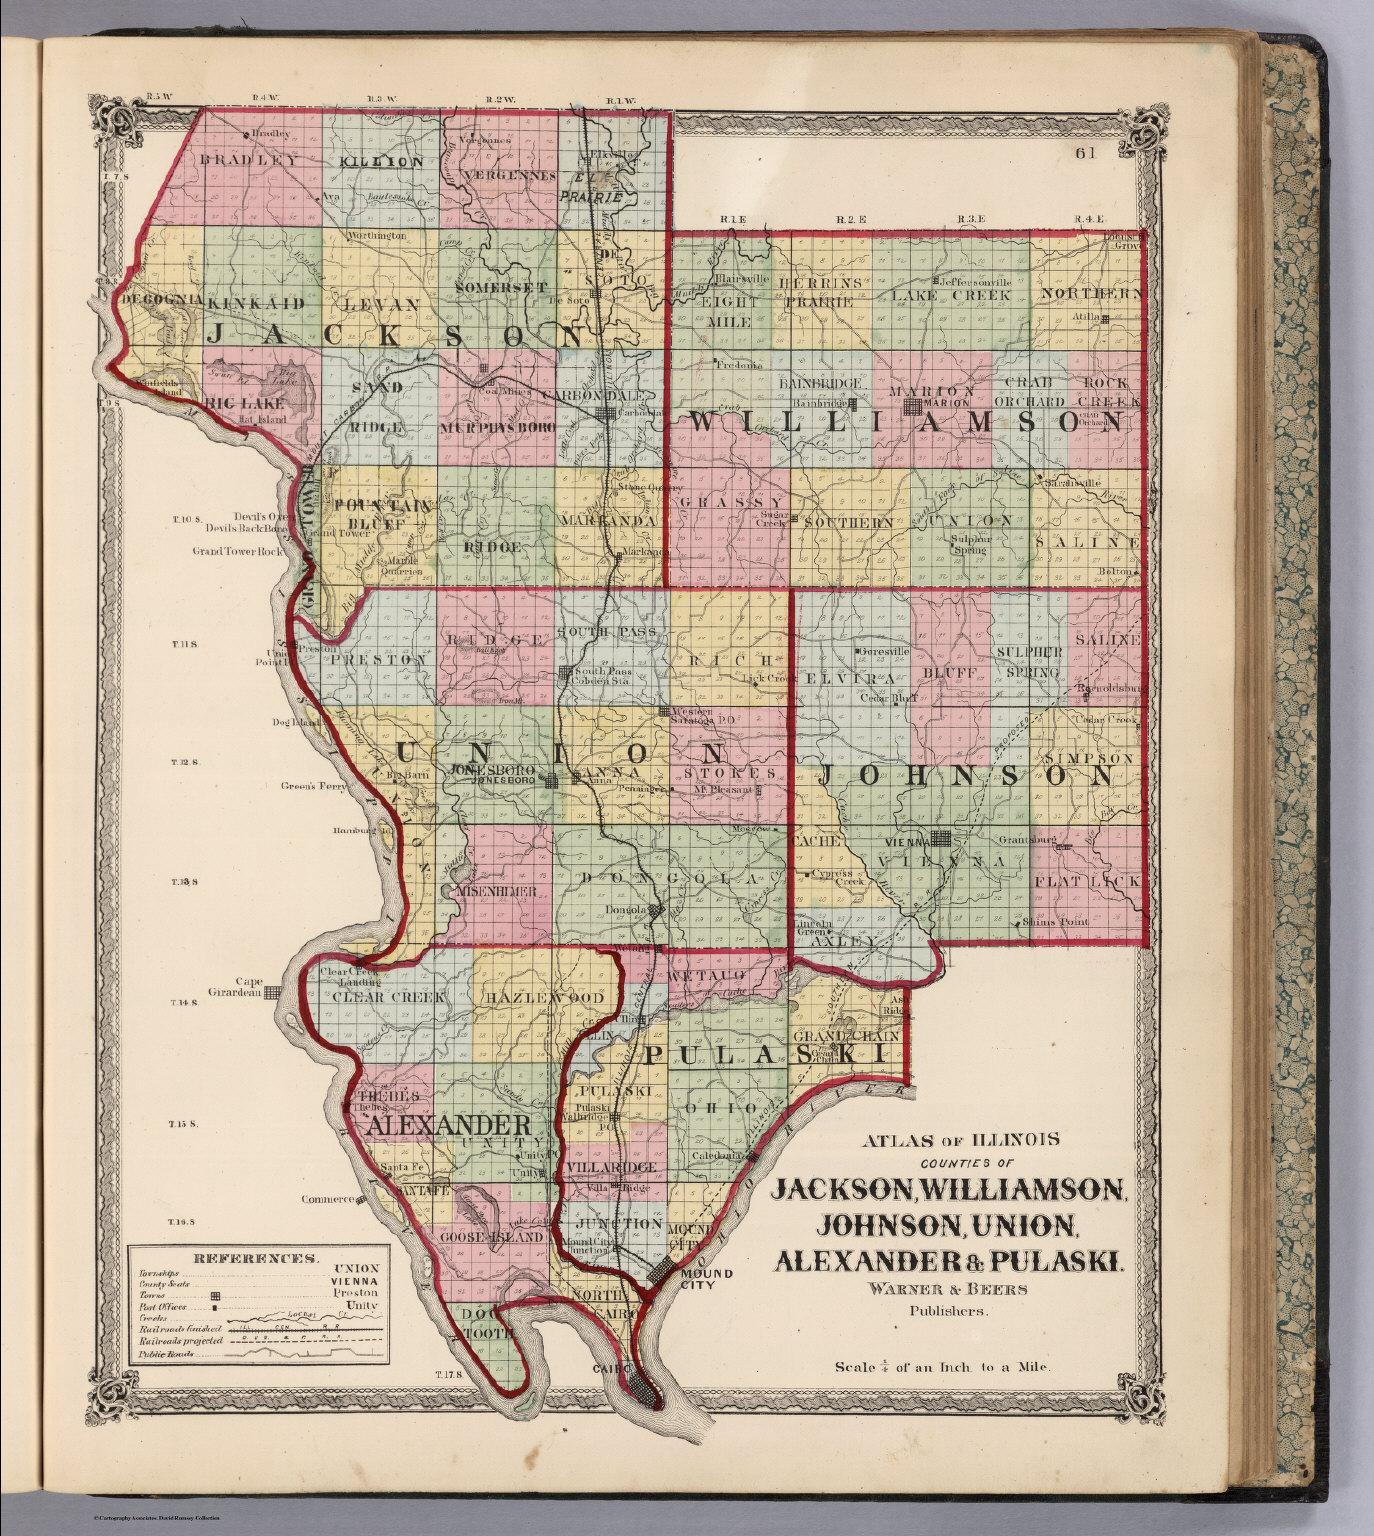 Atlas Of Illinois Counties Of Jackson Williamson Johnson Union